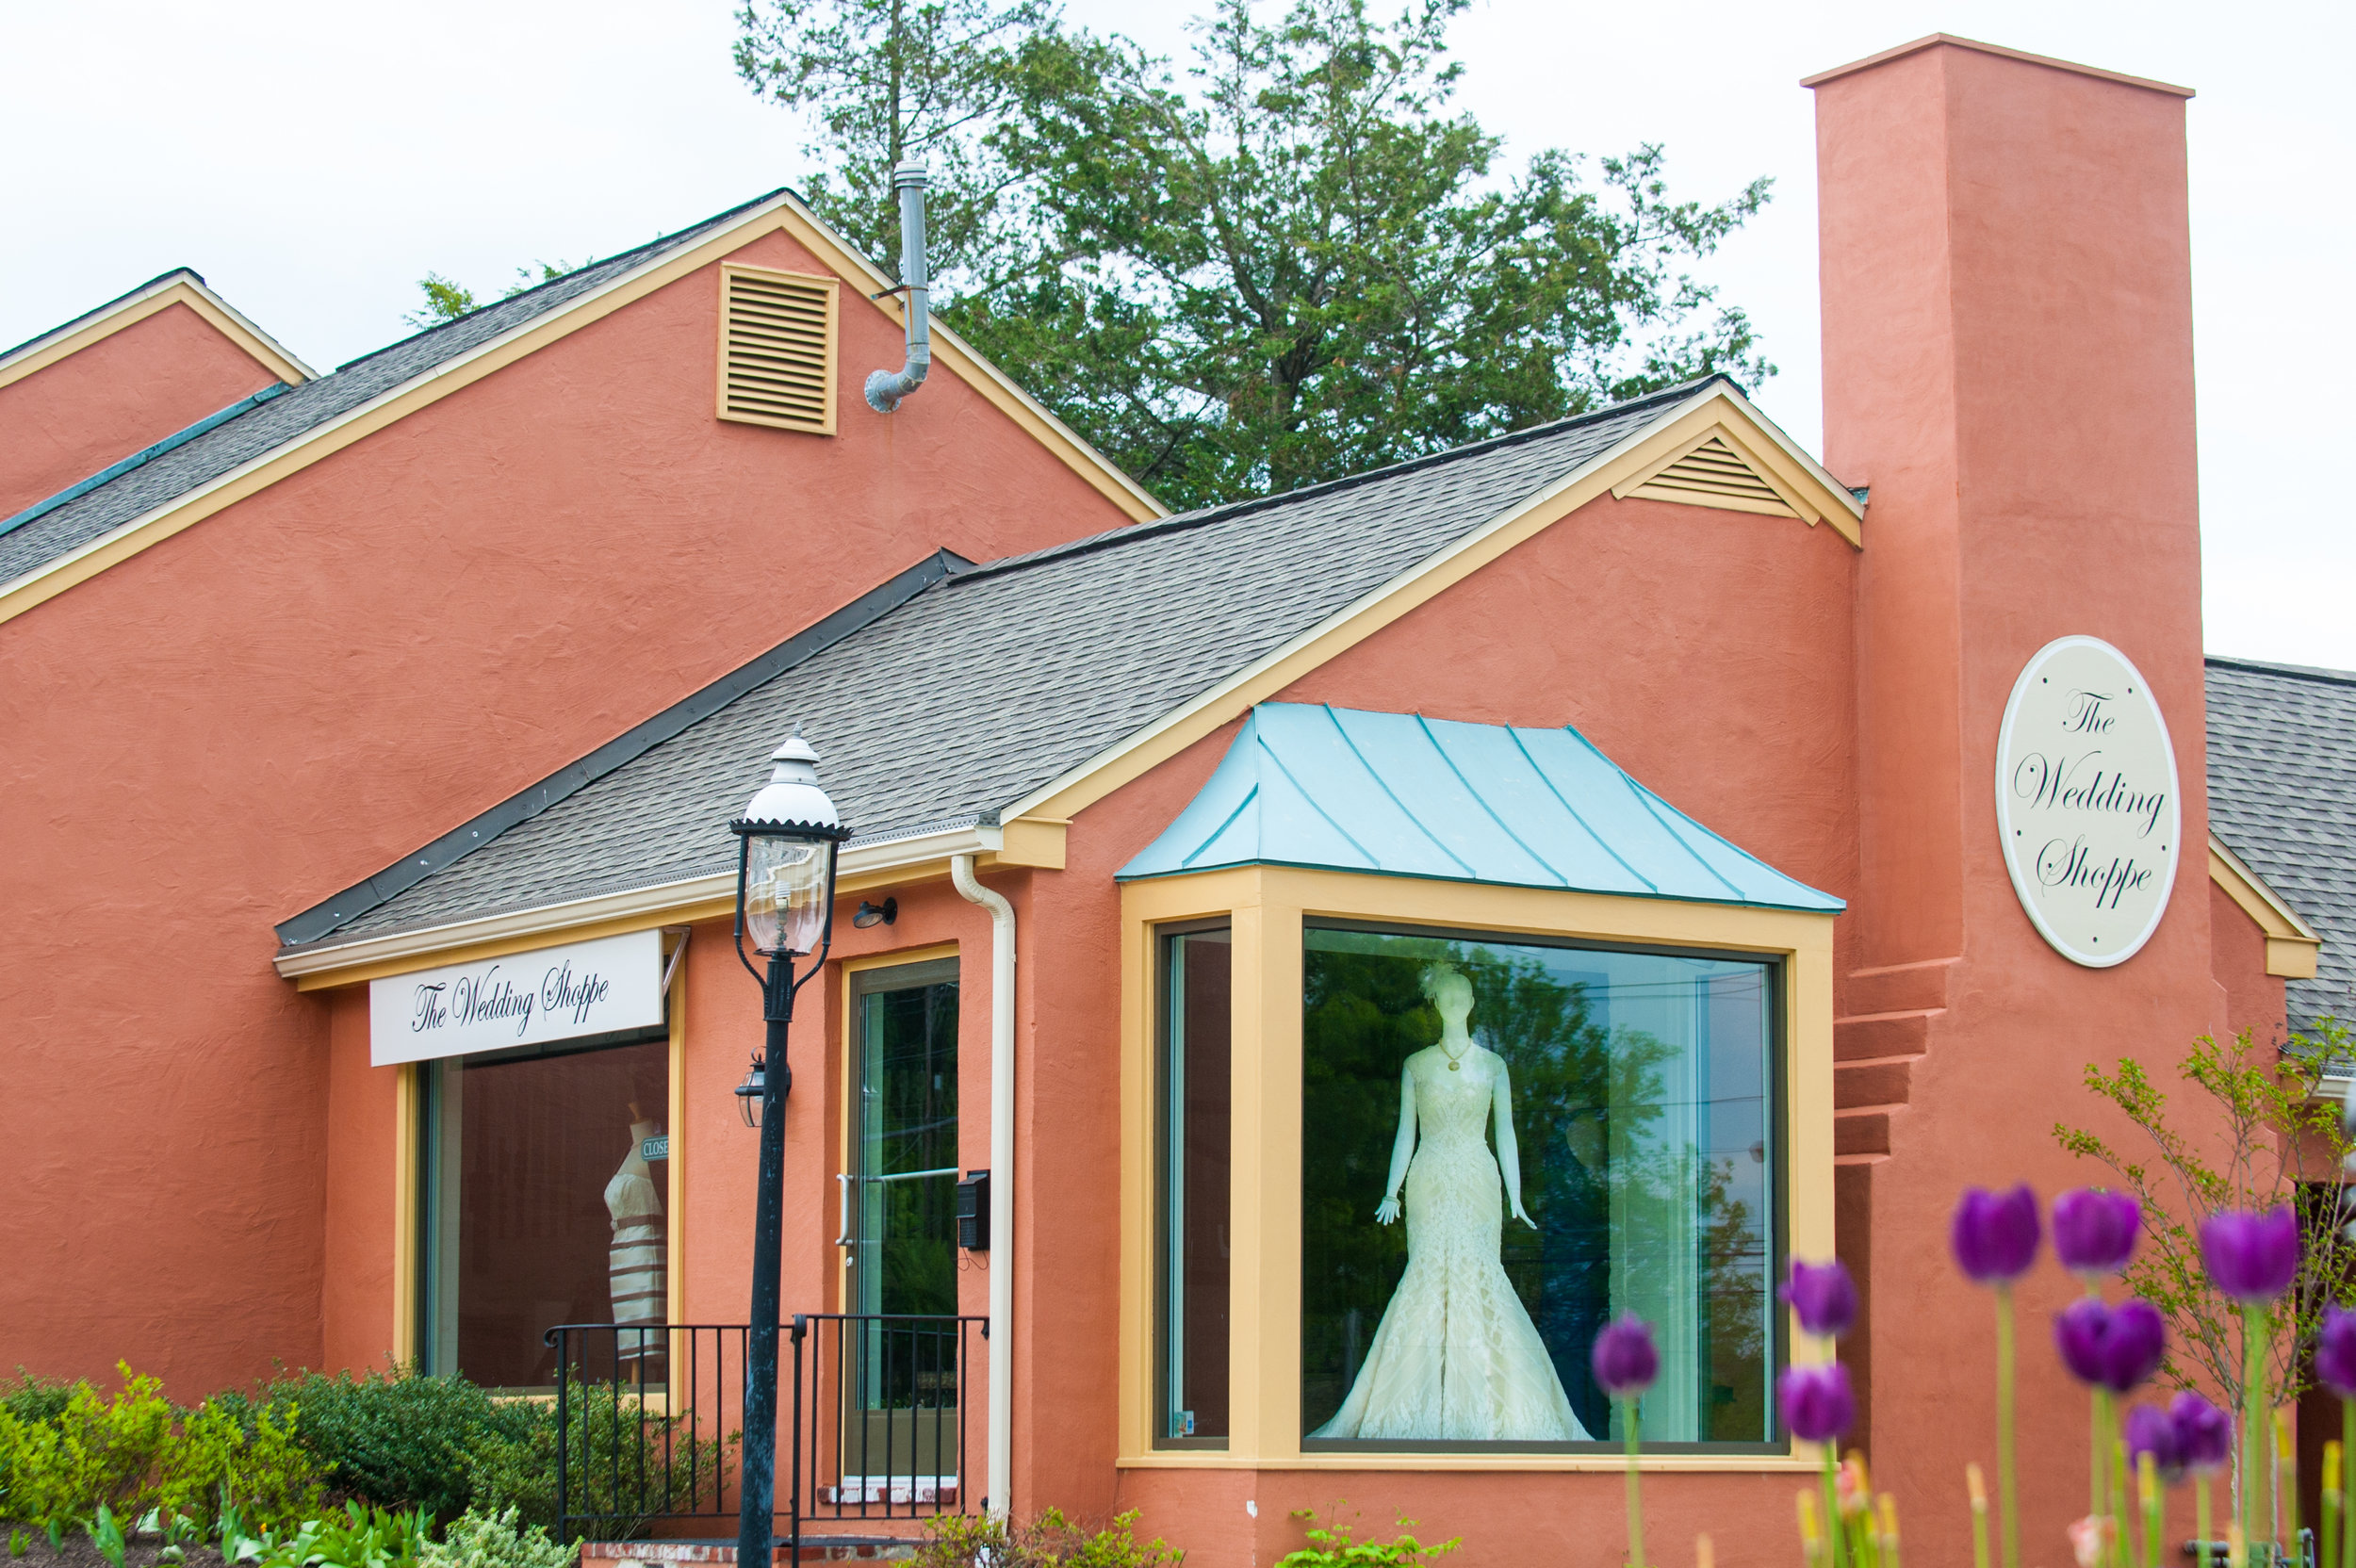 005-WeddingShoppeExterior.jpg